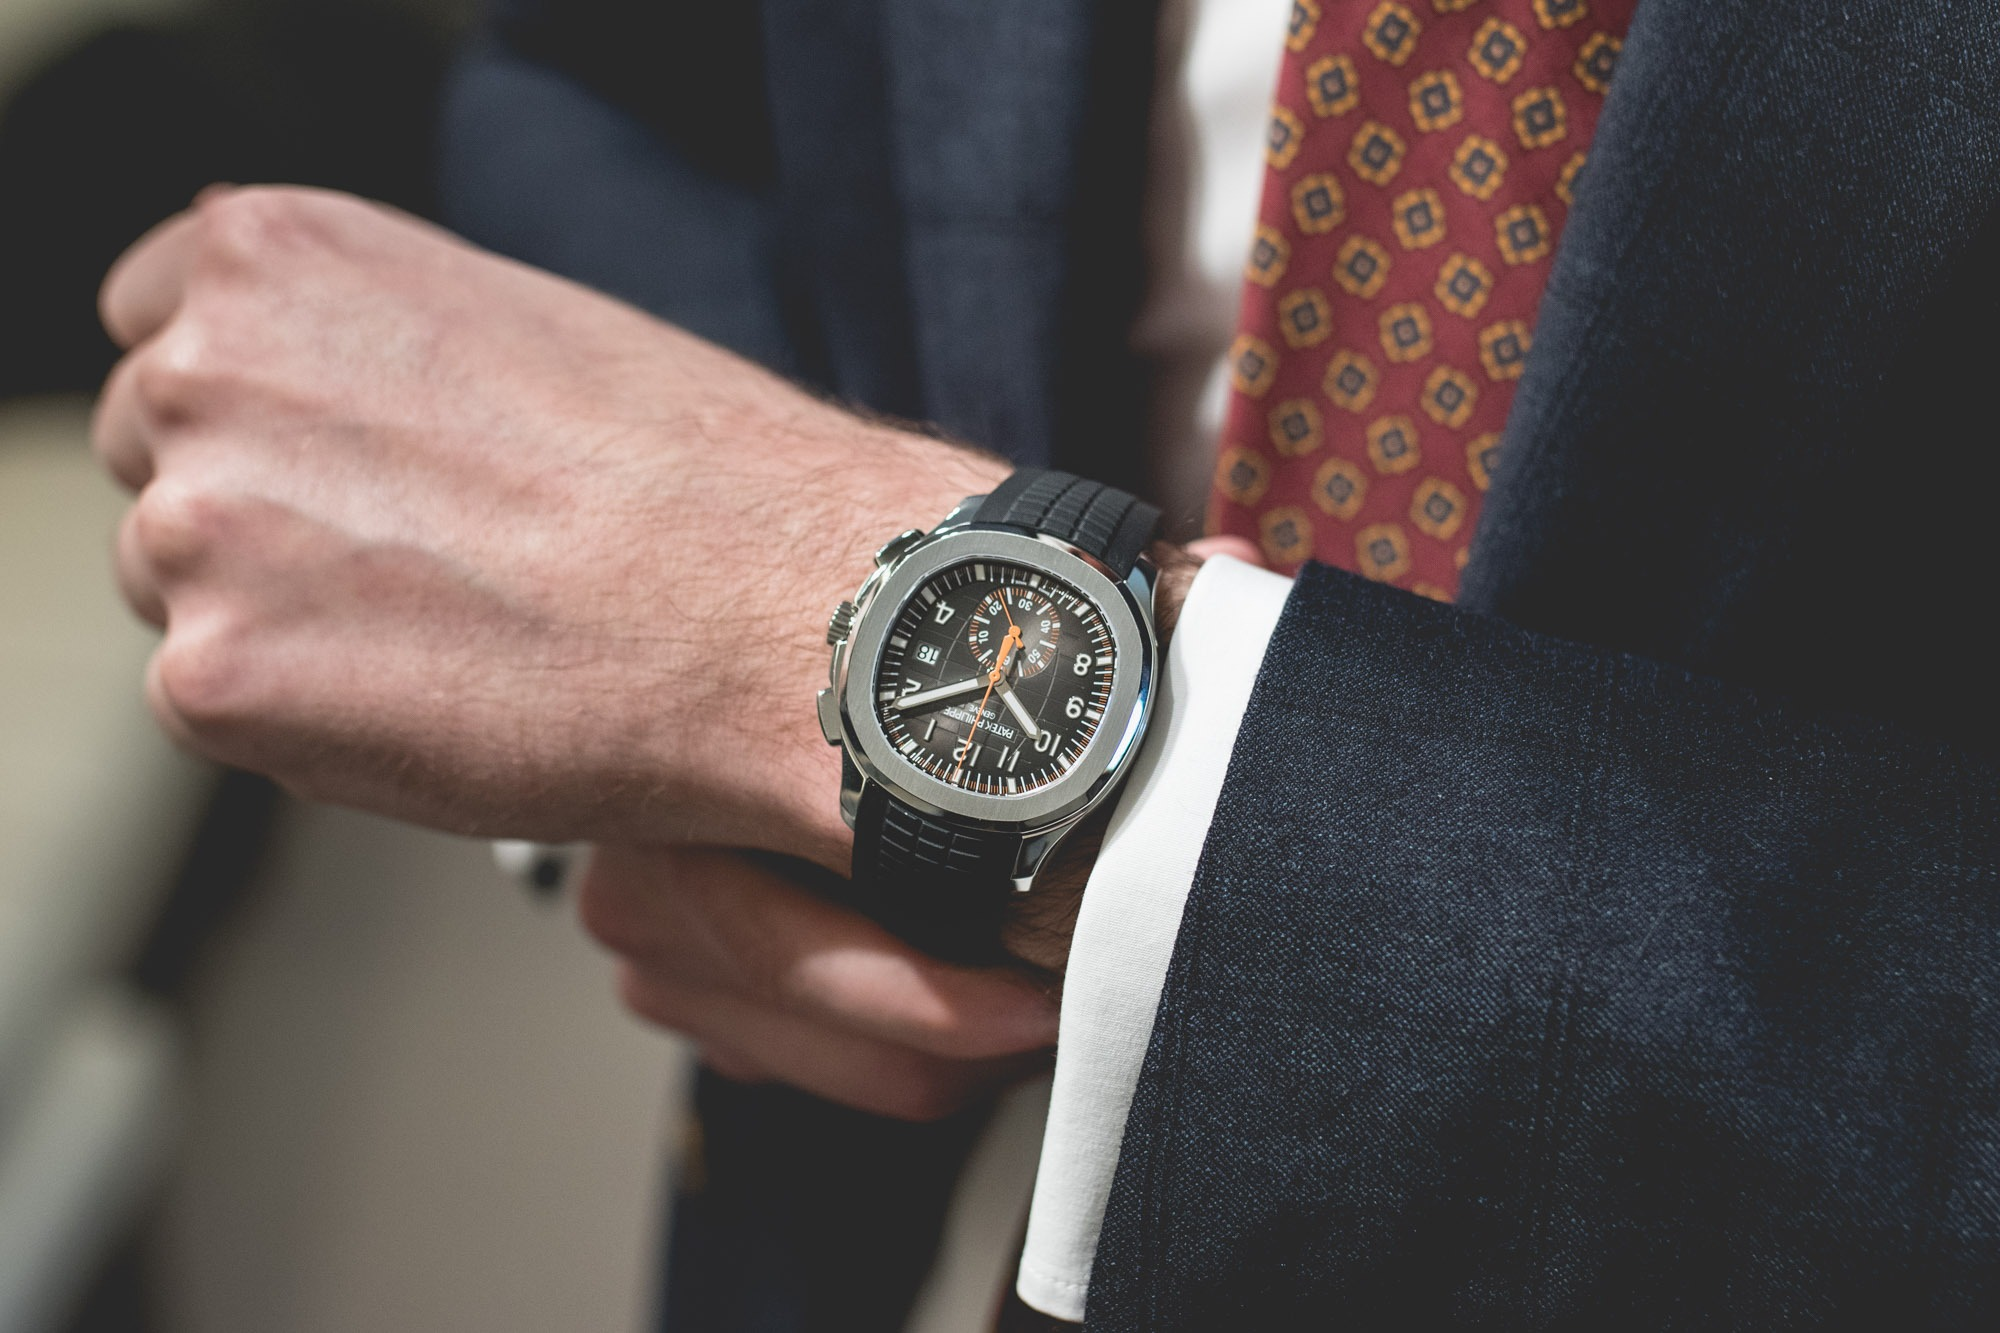 Baselworld 2018 : Patek Philippe Aquanaut Chronopgraph Wrist